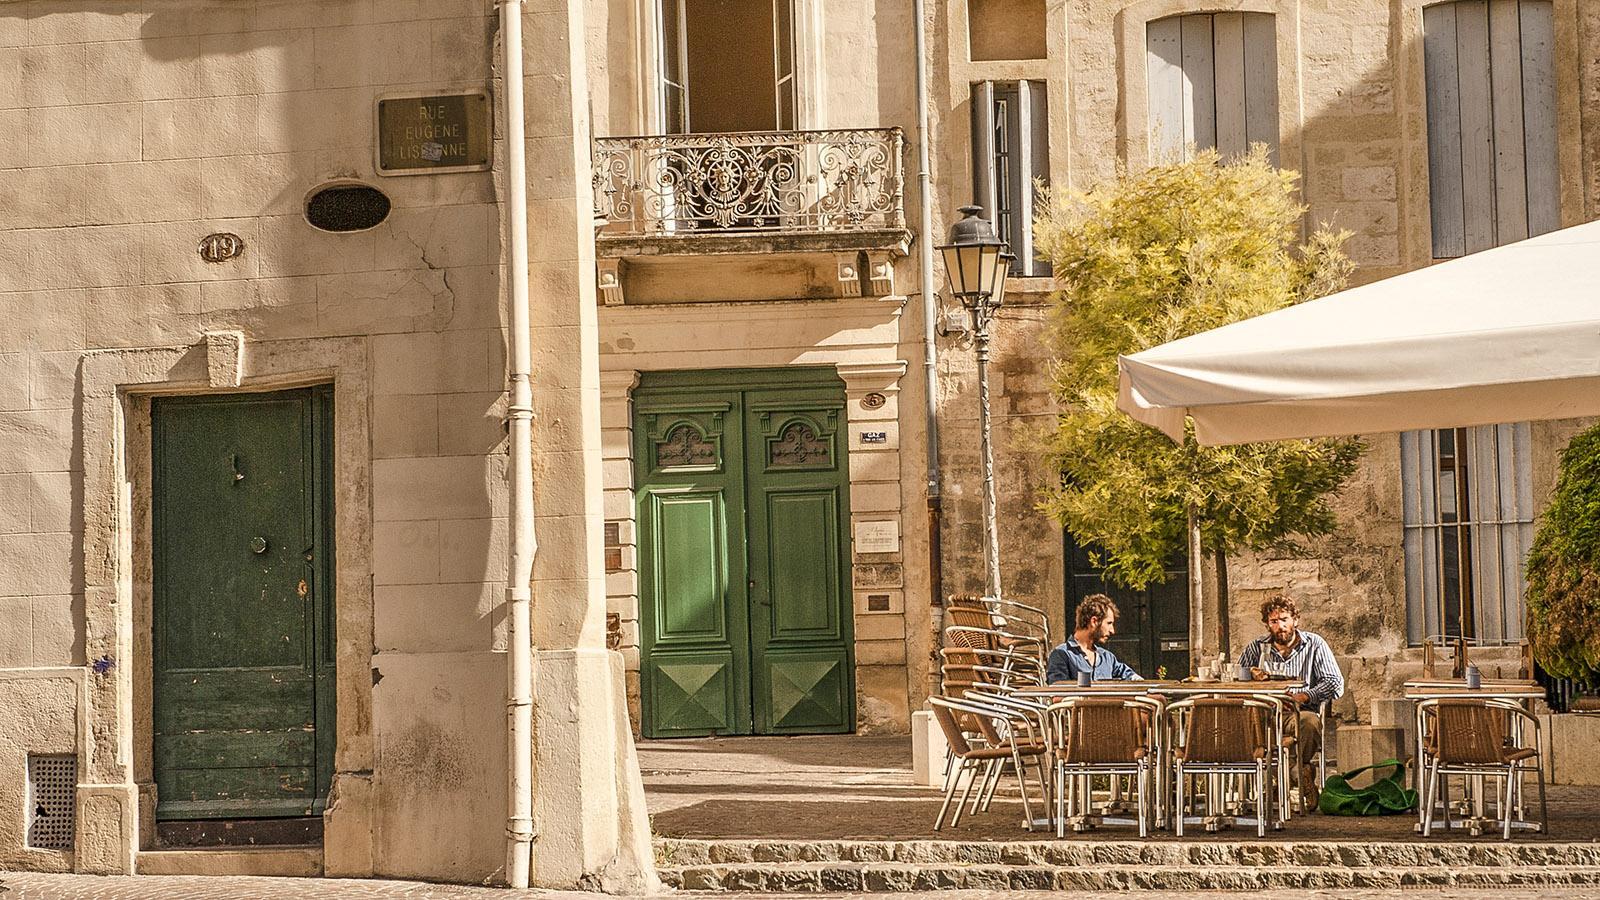 Montpellier: Café in der Altstadt. Foto: Hilke Maunder